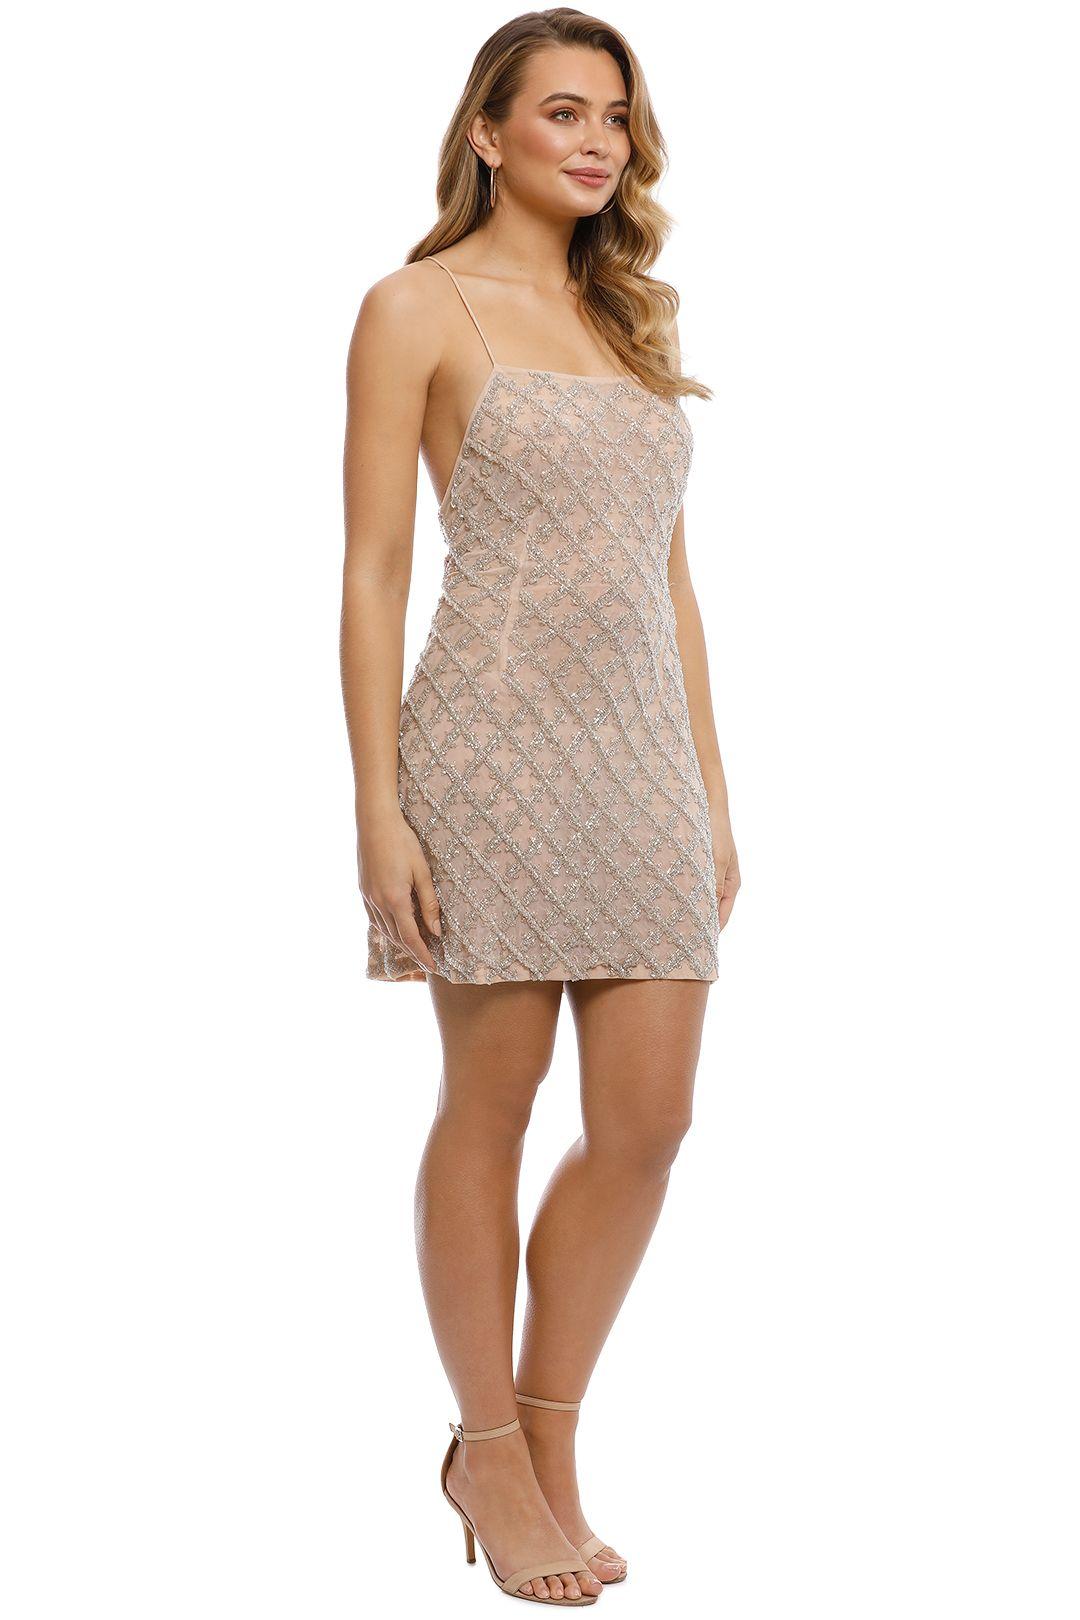 Madame X - Eima Dress - Nude - side